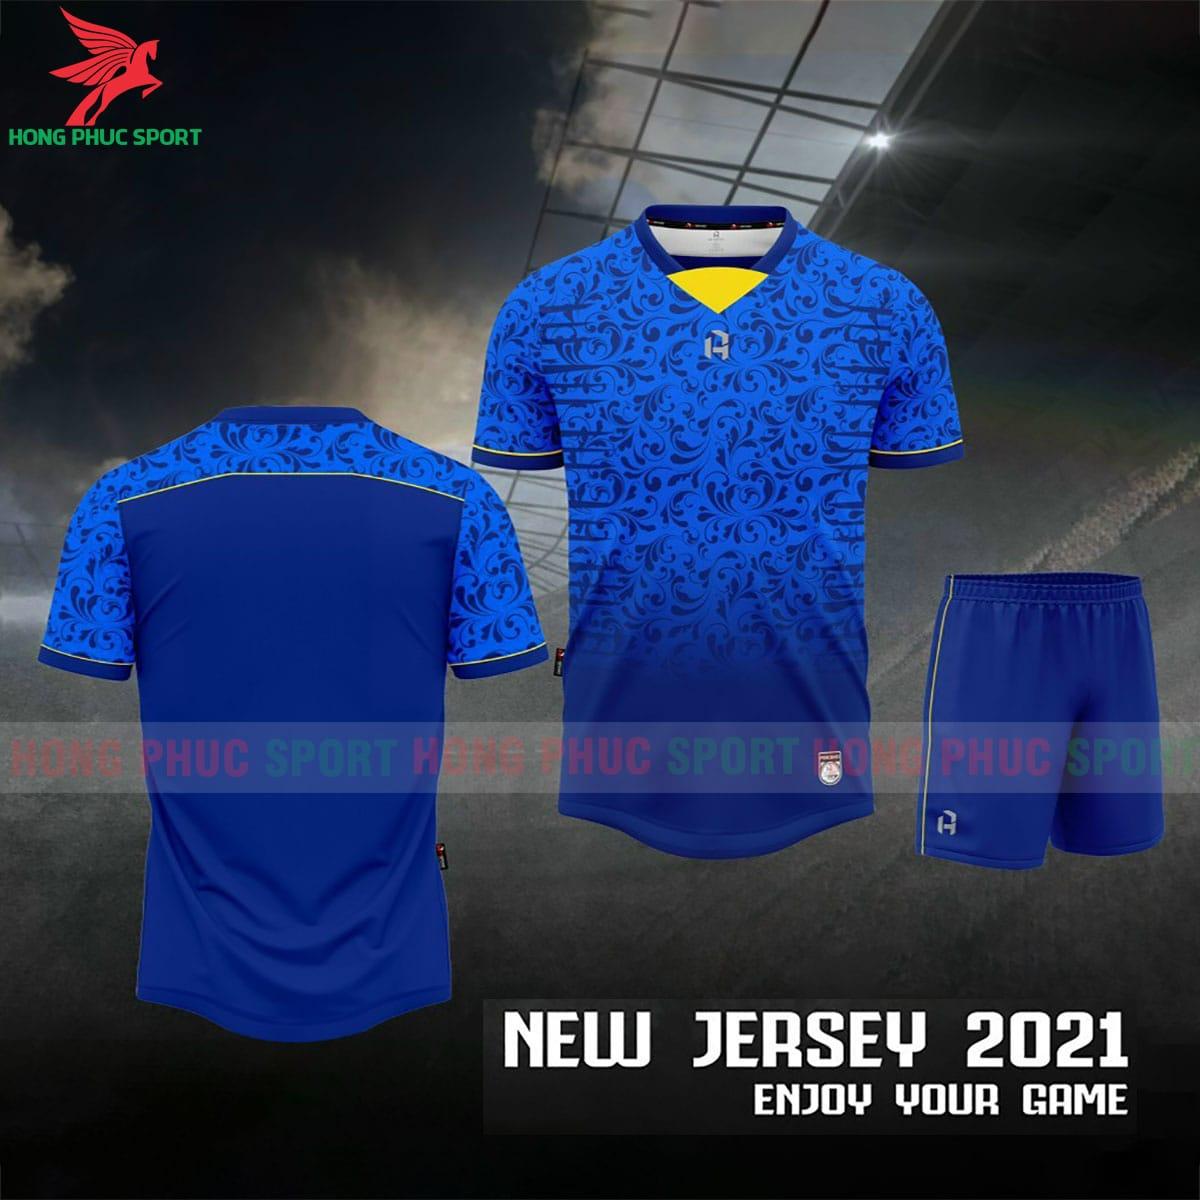 ao-bong-da-hp-sport-2021-pencano-xanh-duong